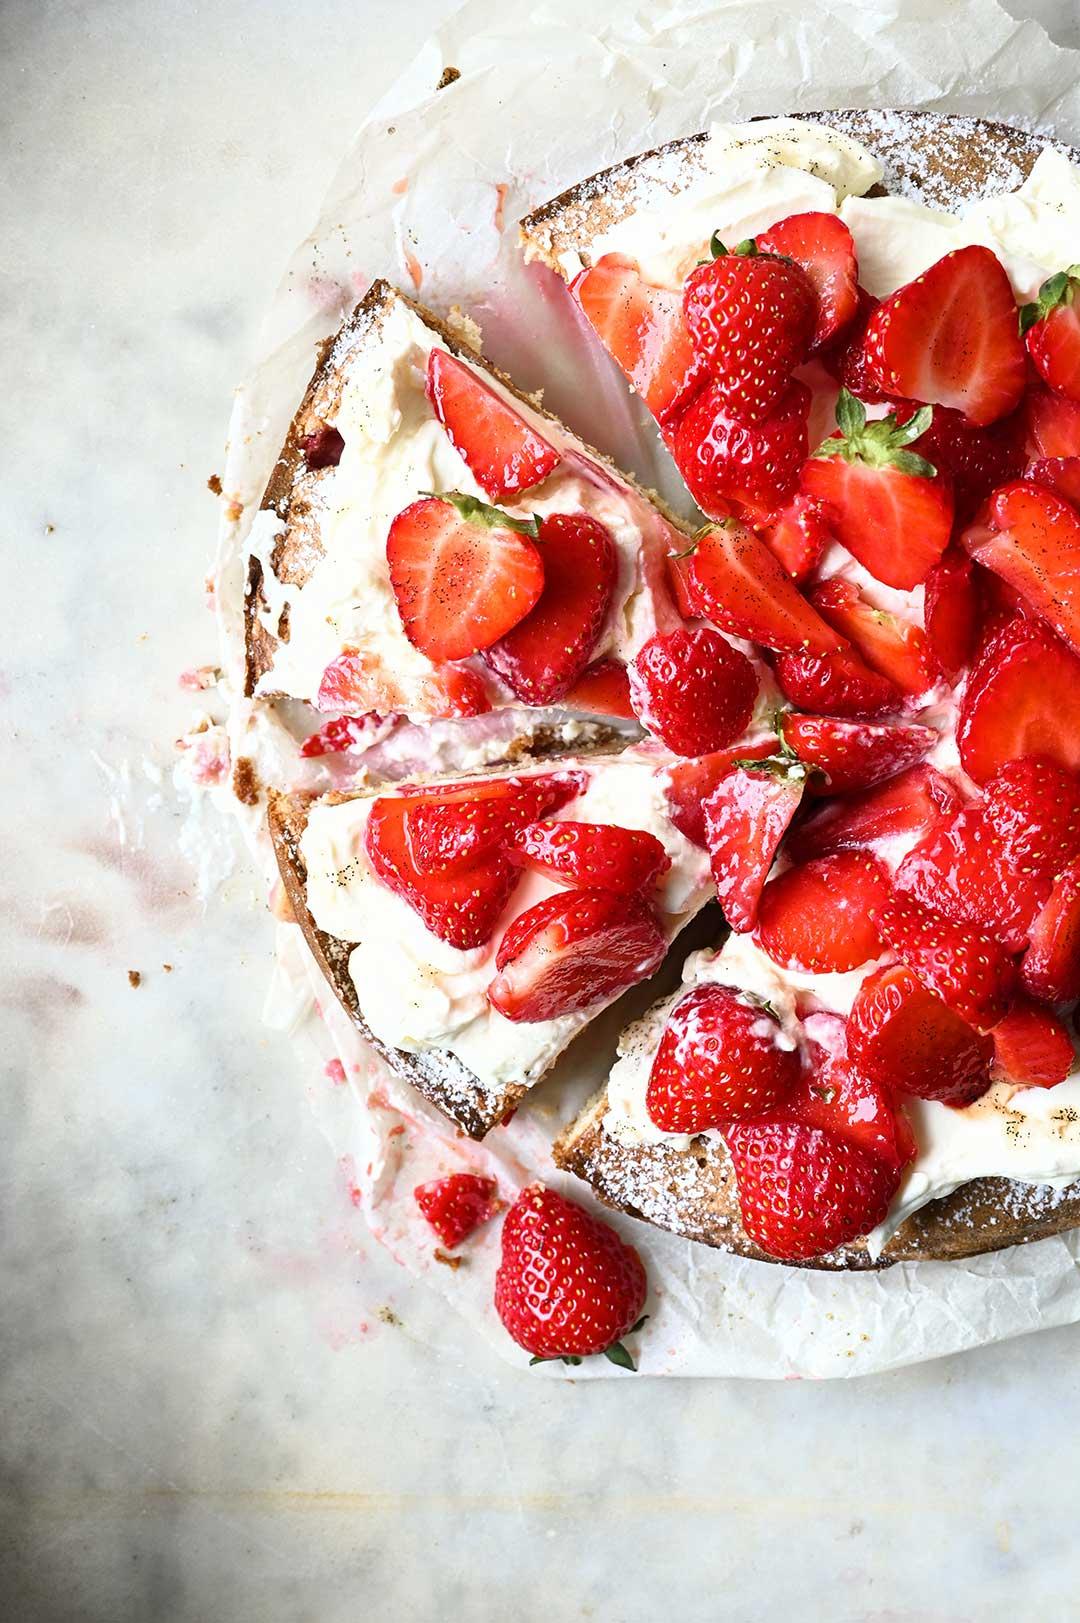 serving dumplings | Strawberry cake with mascarpone whipped cream